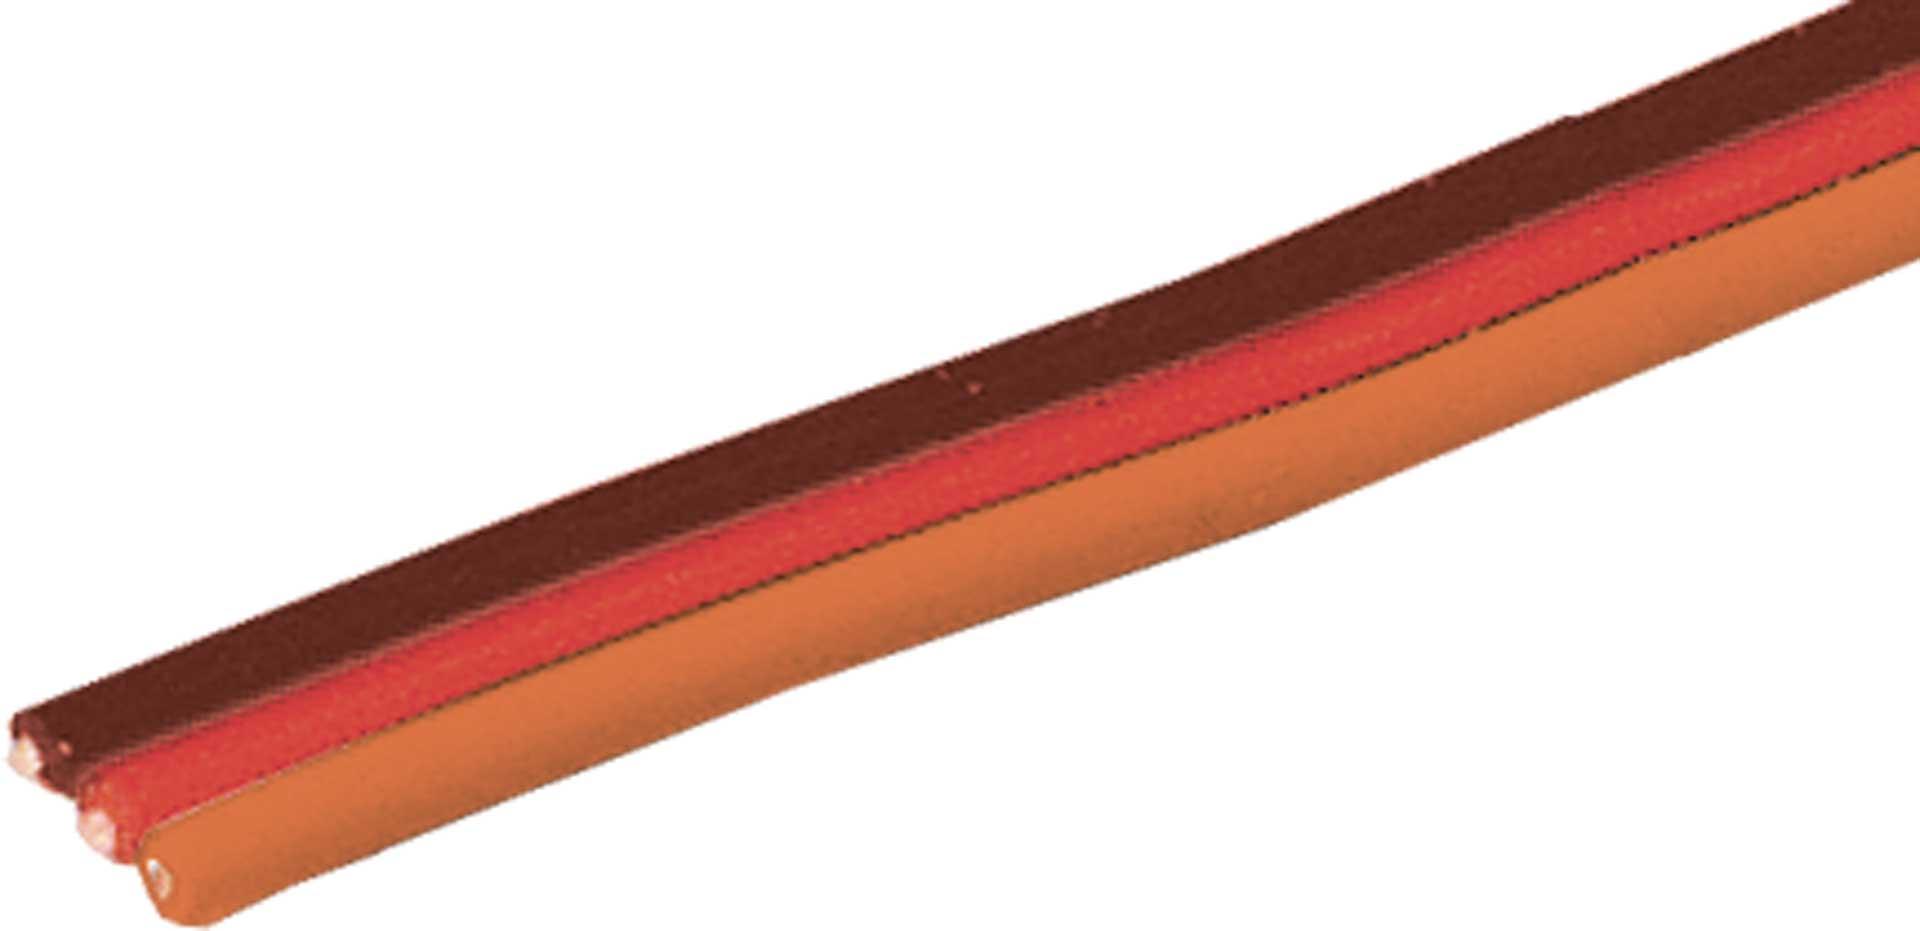 Robbe Modellsport Servokabel Graupner/JR/Uni 10 Meter flach 0,5mm² (20AWG) PVC Meterware